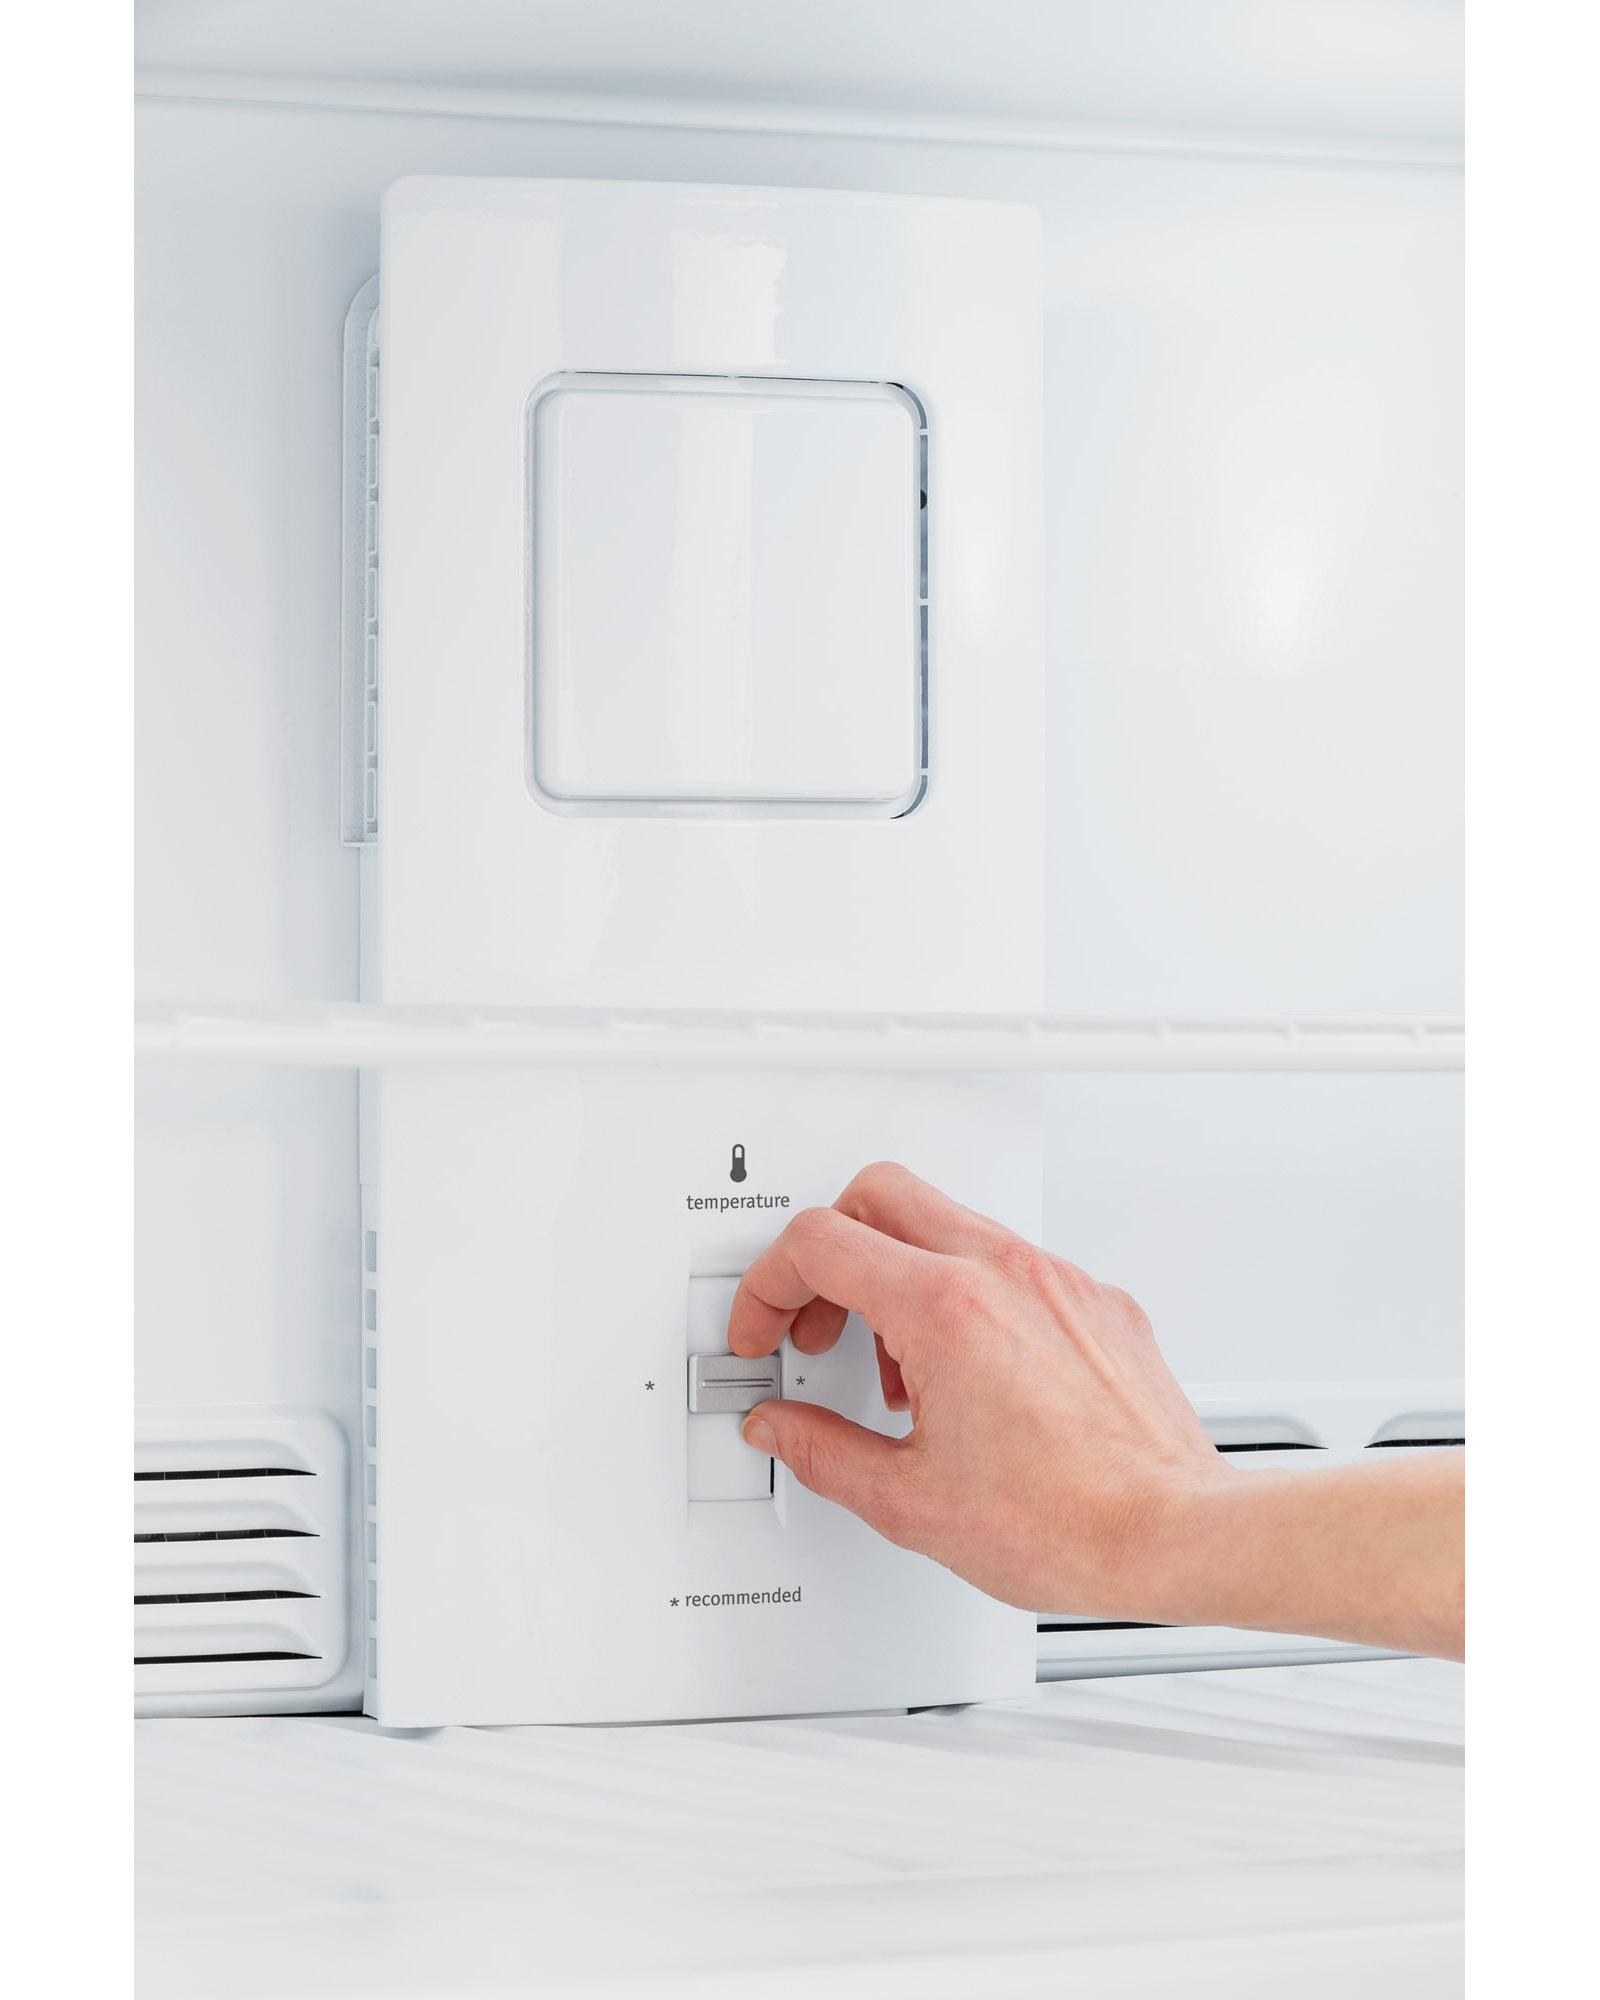 Frigidaire FFHT1621QW 16.3 cu. ft. Top-Mount Refrigerator - White